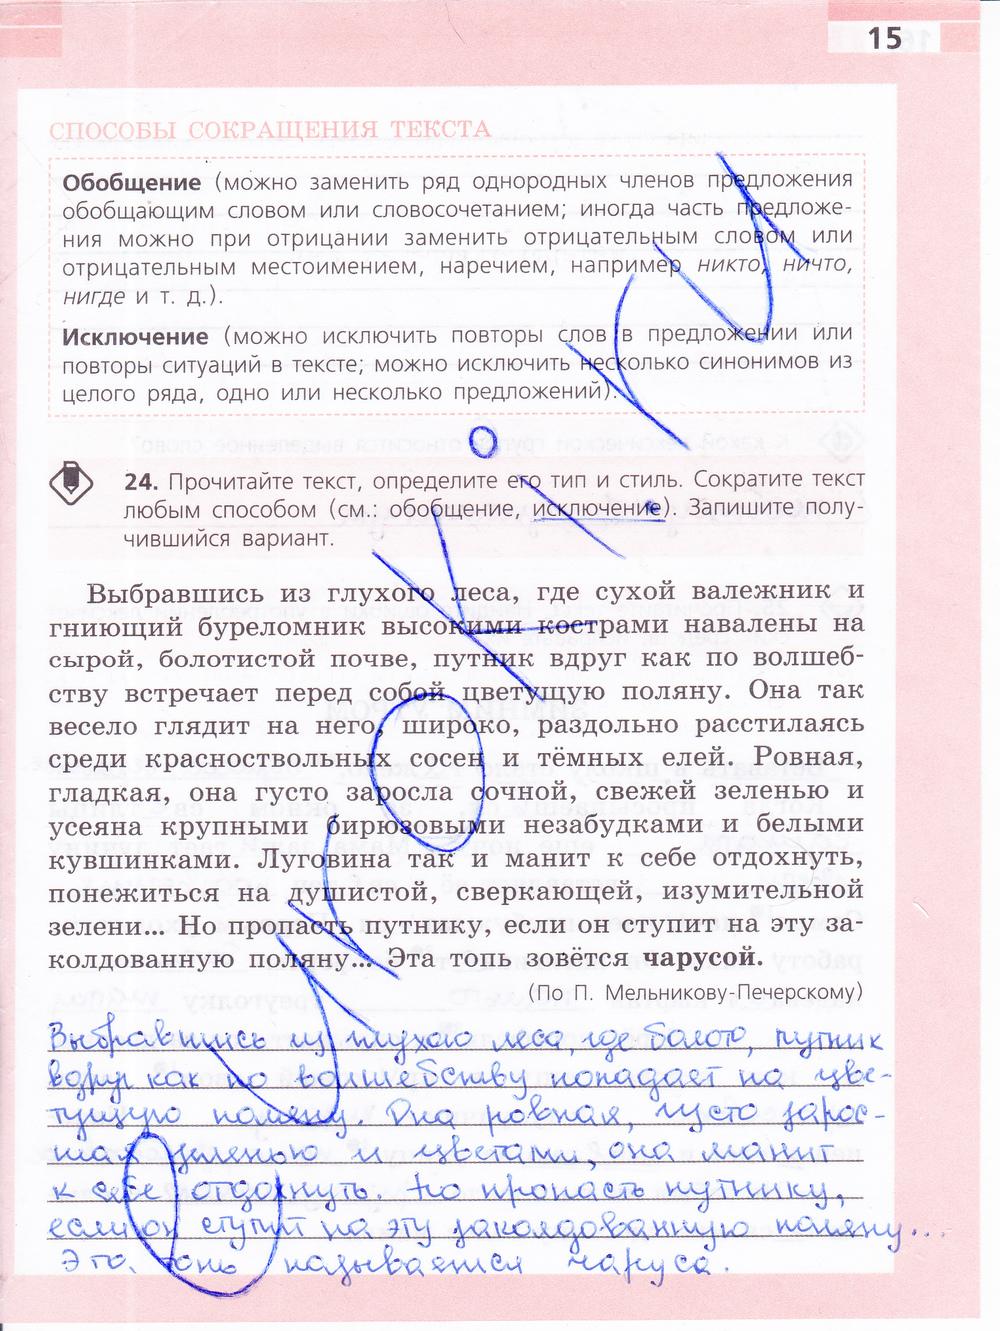 рабочая гдз класс 6 ефремова за е.а русскому тетрадь языку по